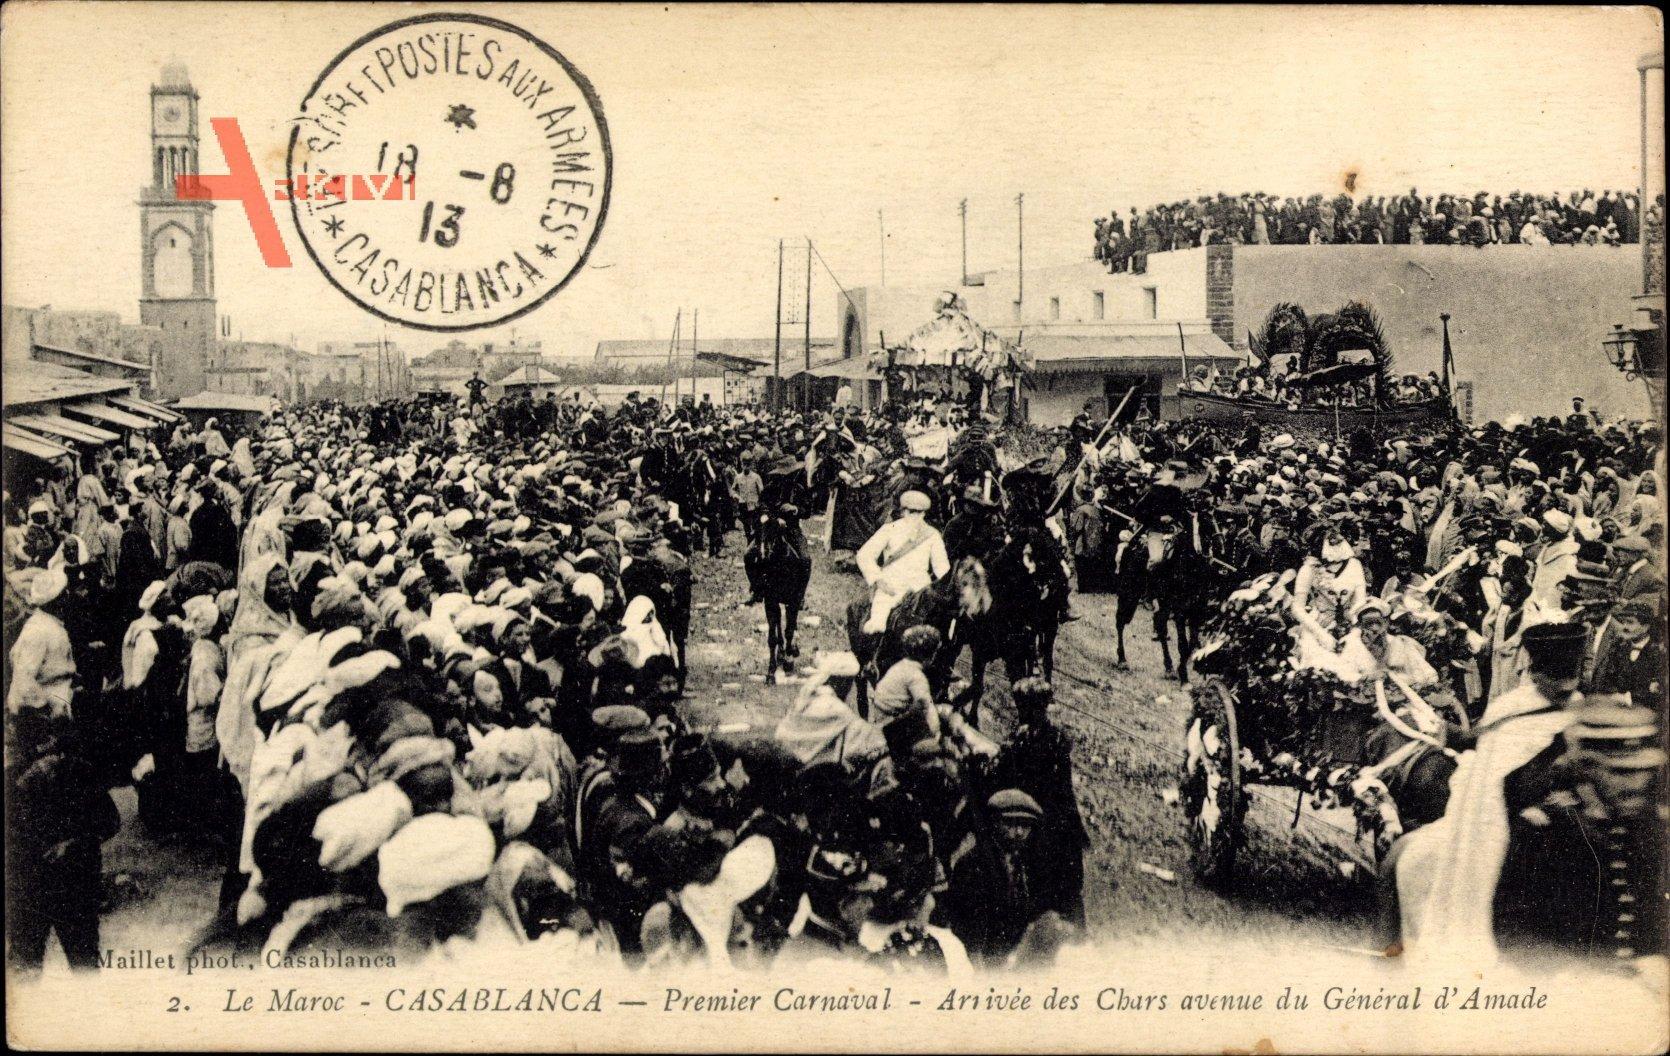 Casablanca Marokko, Premier Carnaval,Arrivee des Chars avenue General dAmade